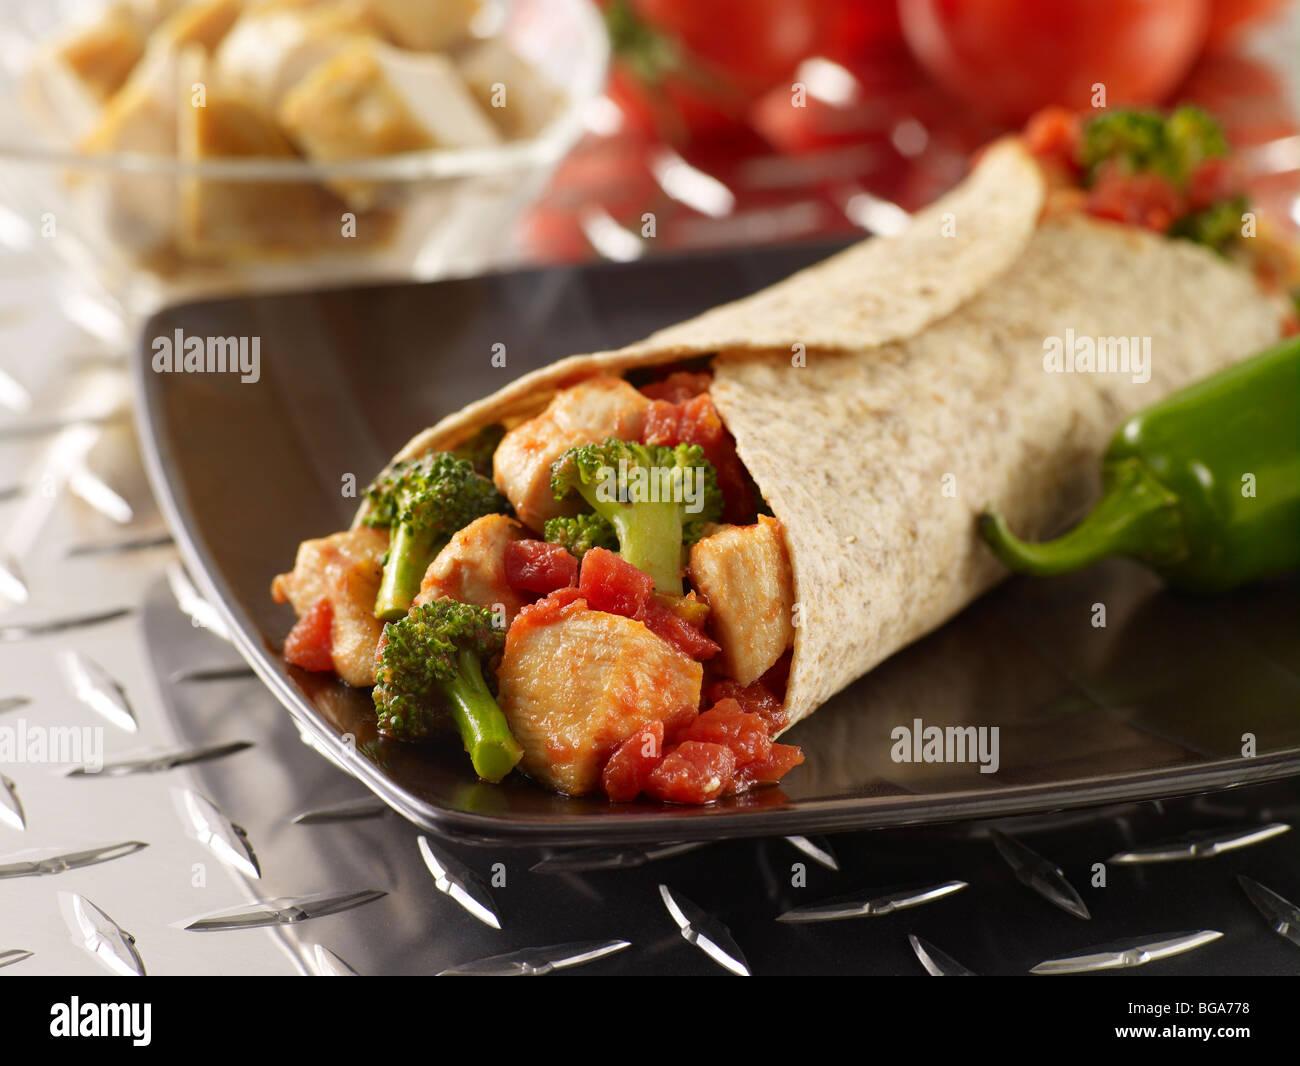 Huhn und Brokkoli Burrito mit Vollkorn-tortilla Stockbild